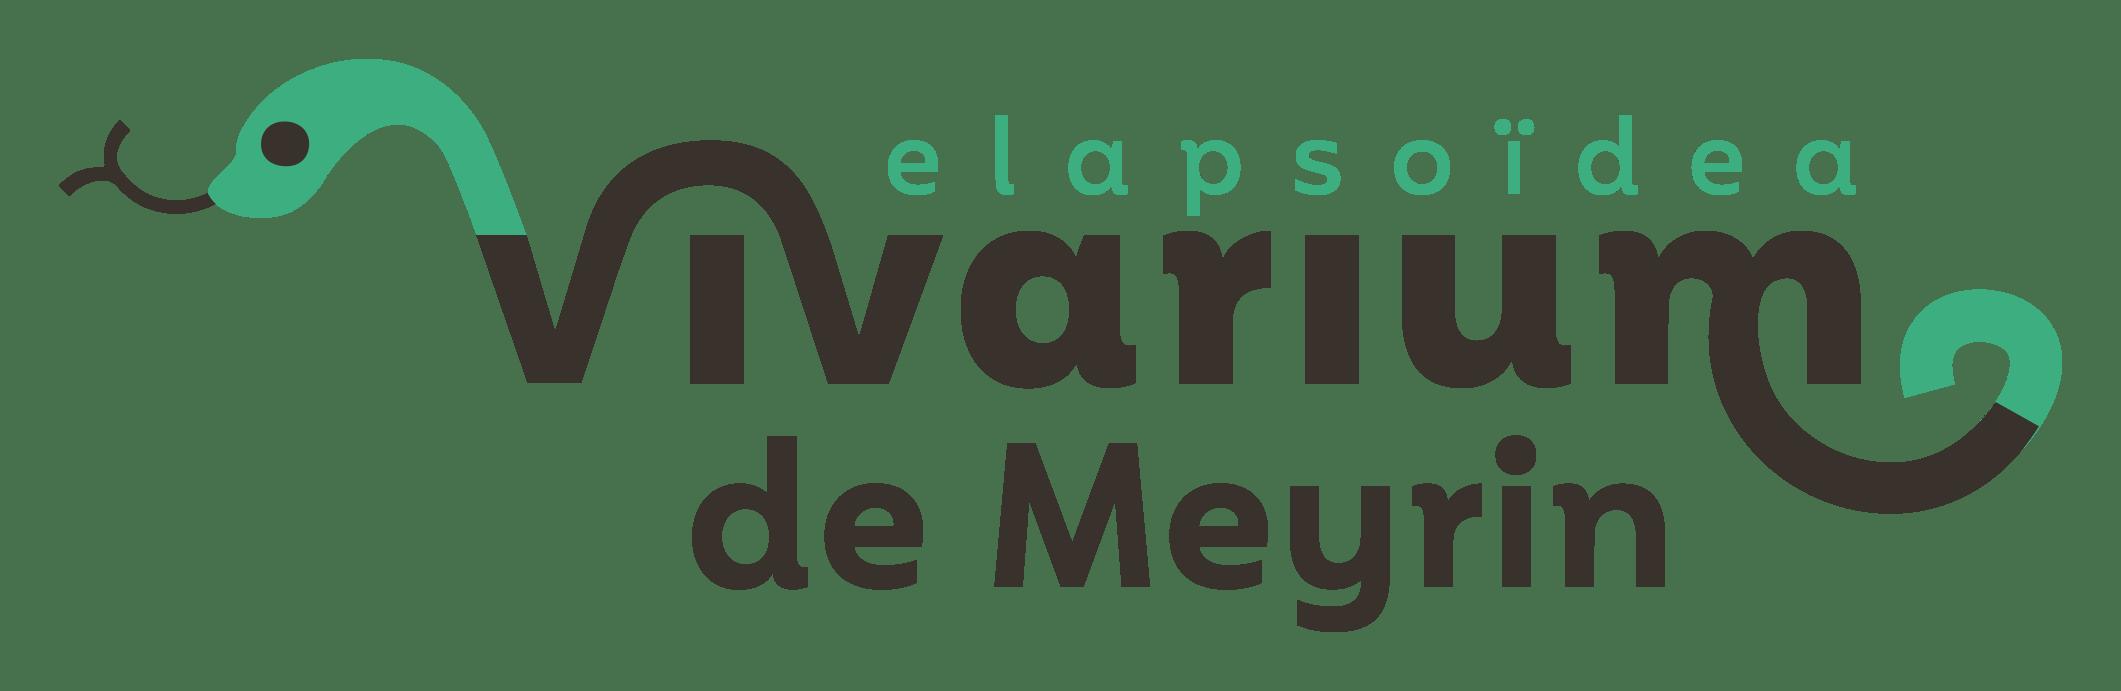 Vivarium de Meyrin